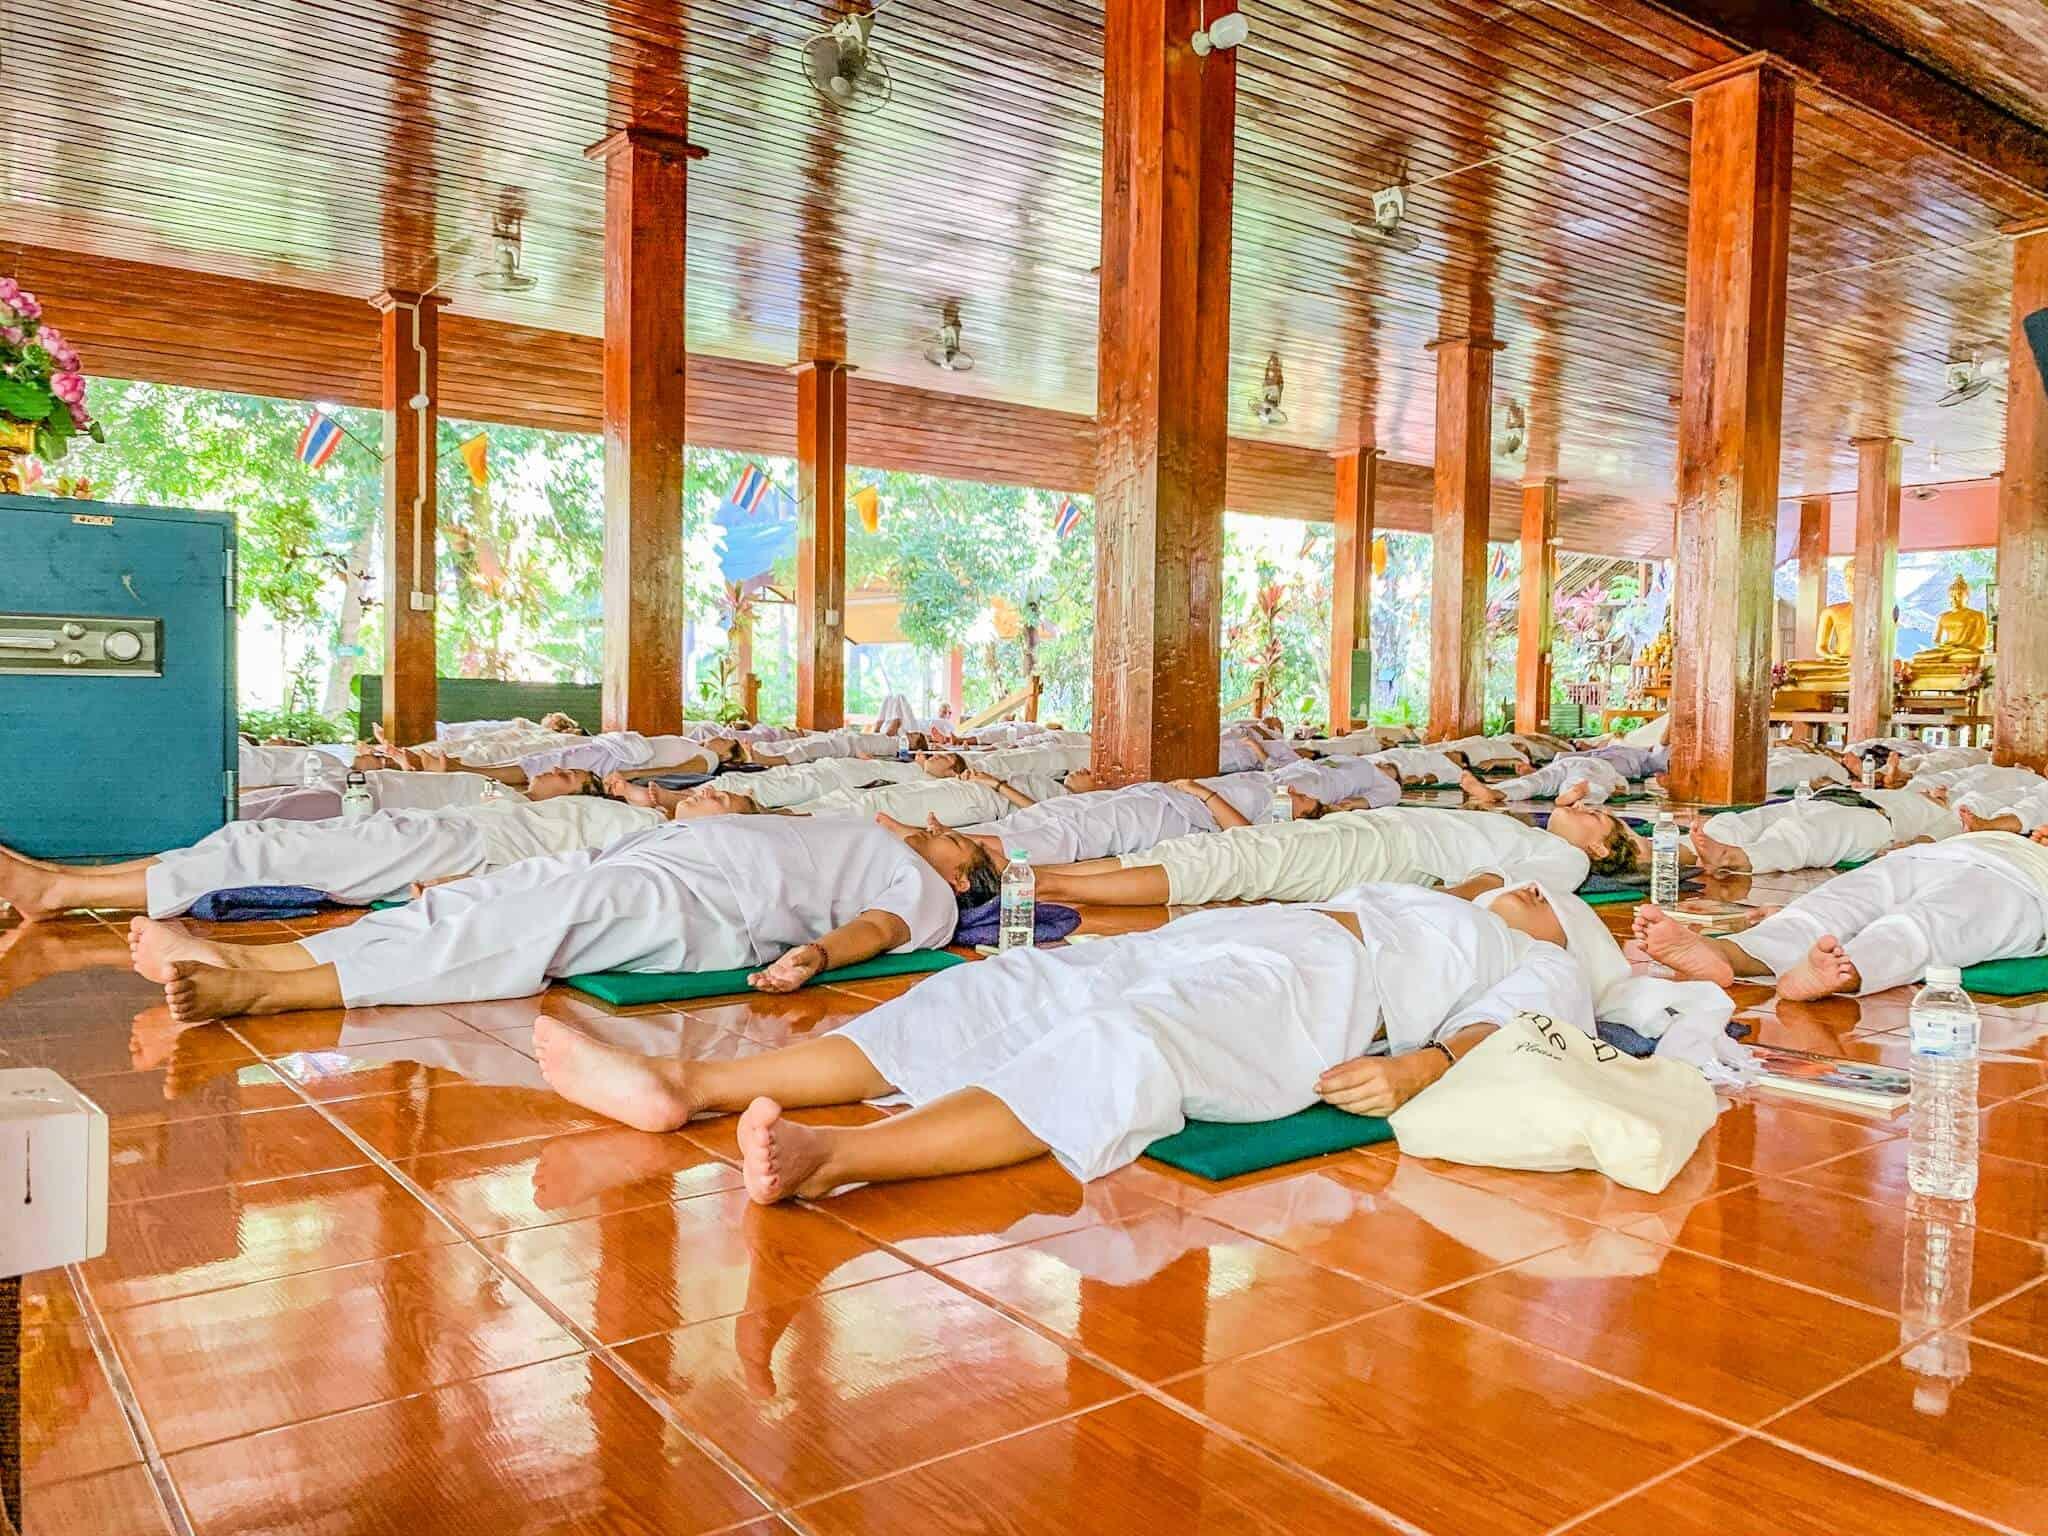 Lying Meditation im Wat Pa Tam Wua Forest Monastery